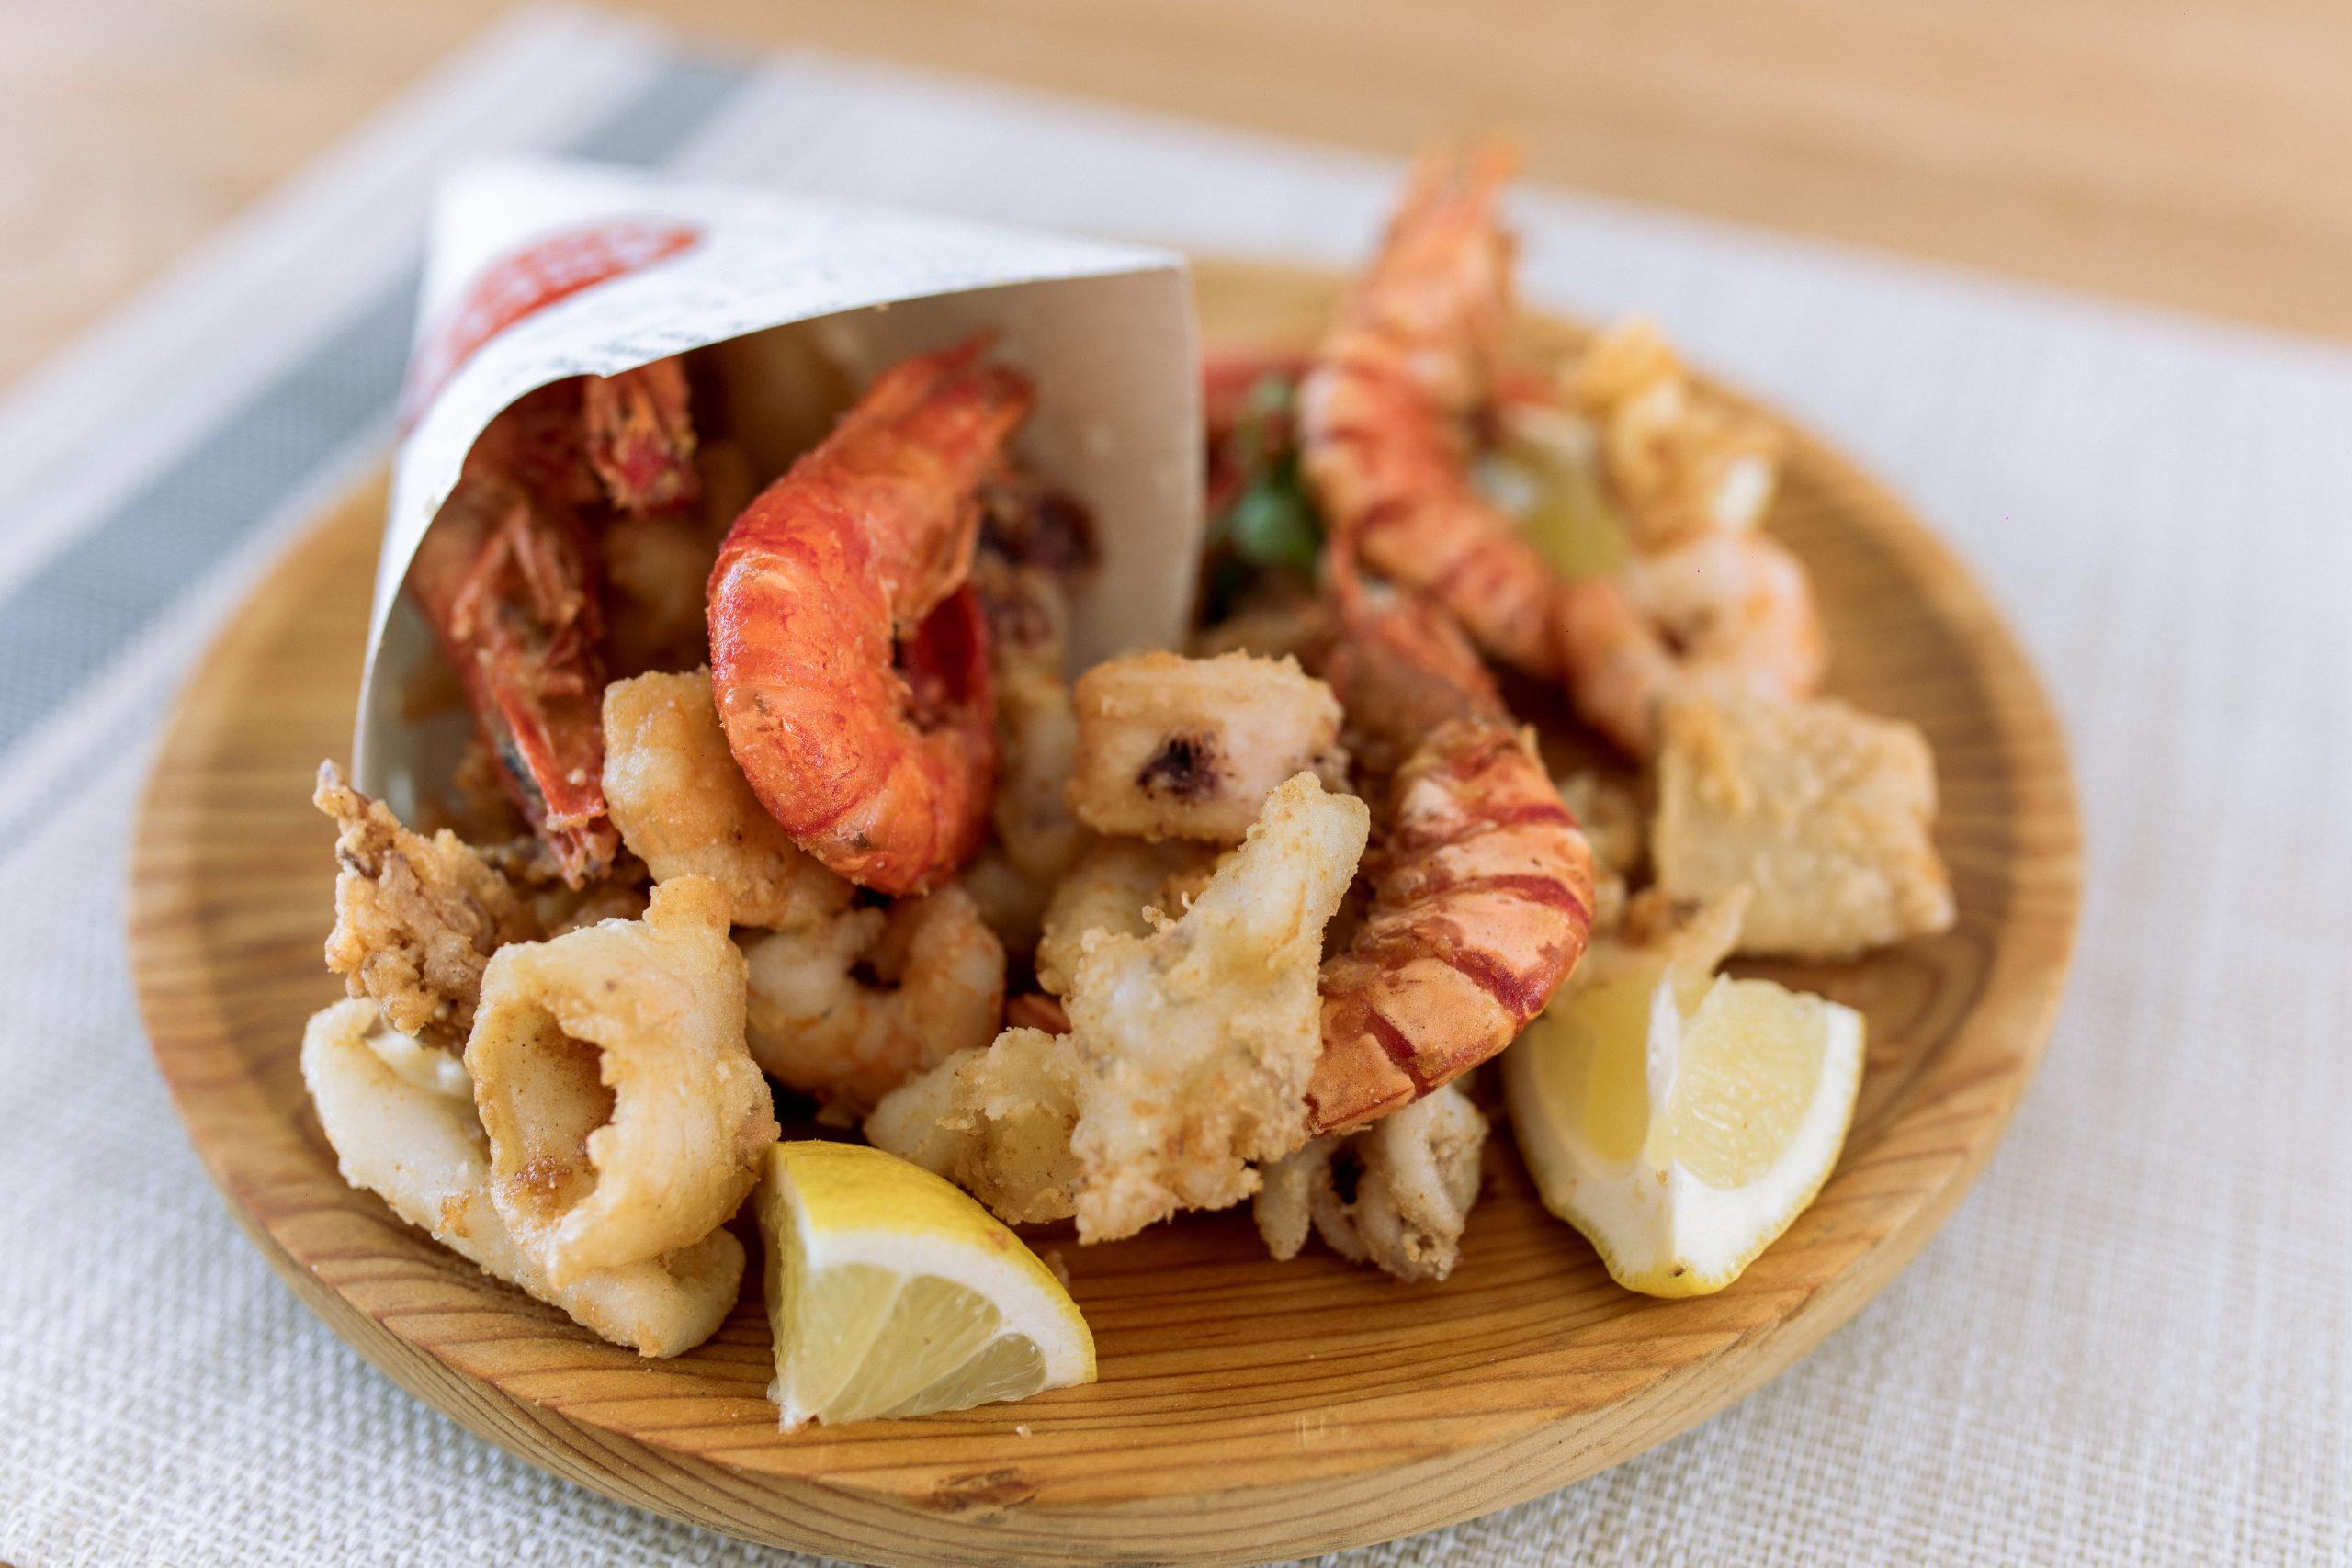 fritura de sepia, calamar y langostinos